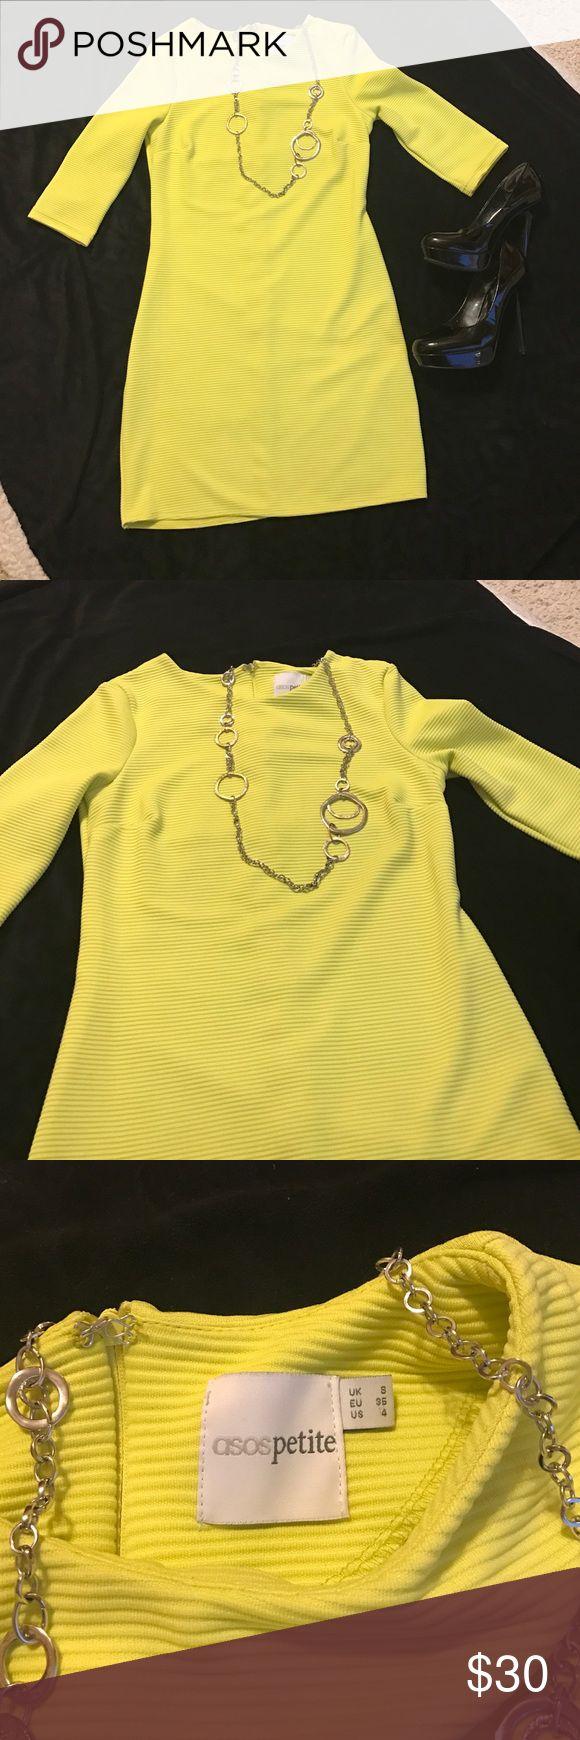 Women's Petite Dress Asos Petite Dress ~ Size 4. Perfect condition. Great New Years Eve Dress. ASOS Petite Dresses Midi